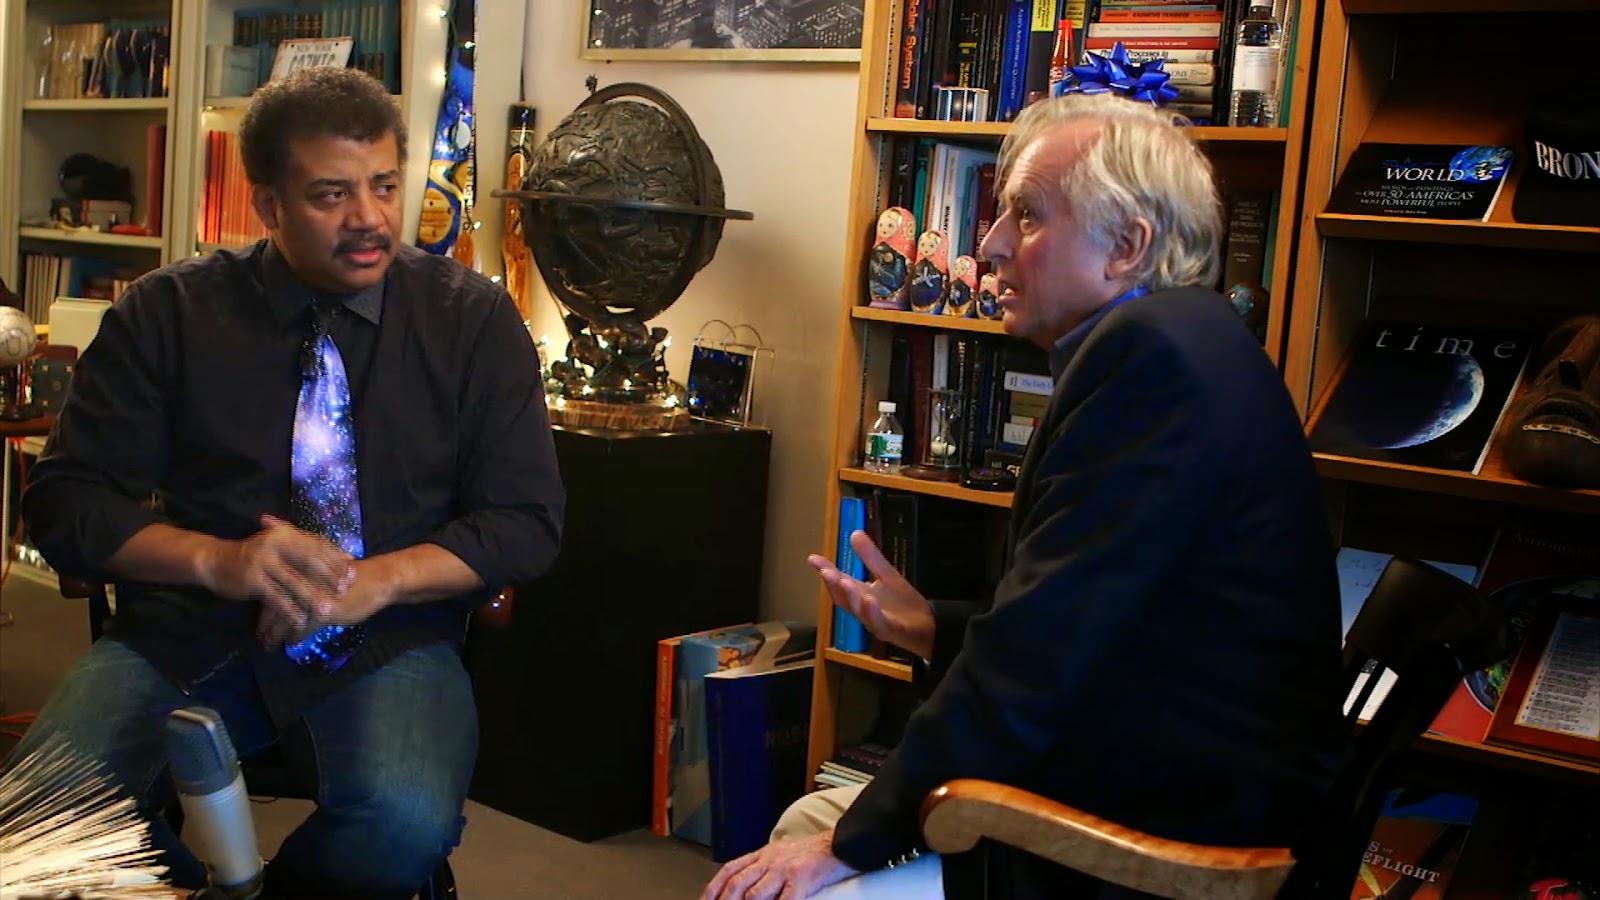 Dawkins and Tyson